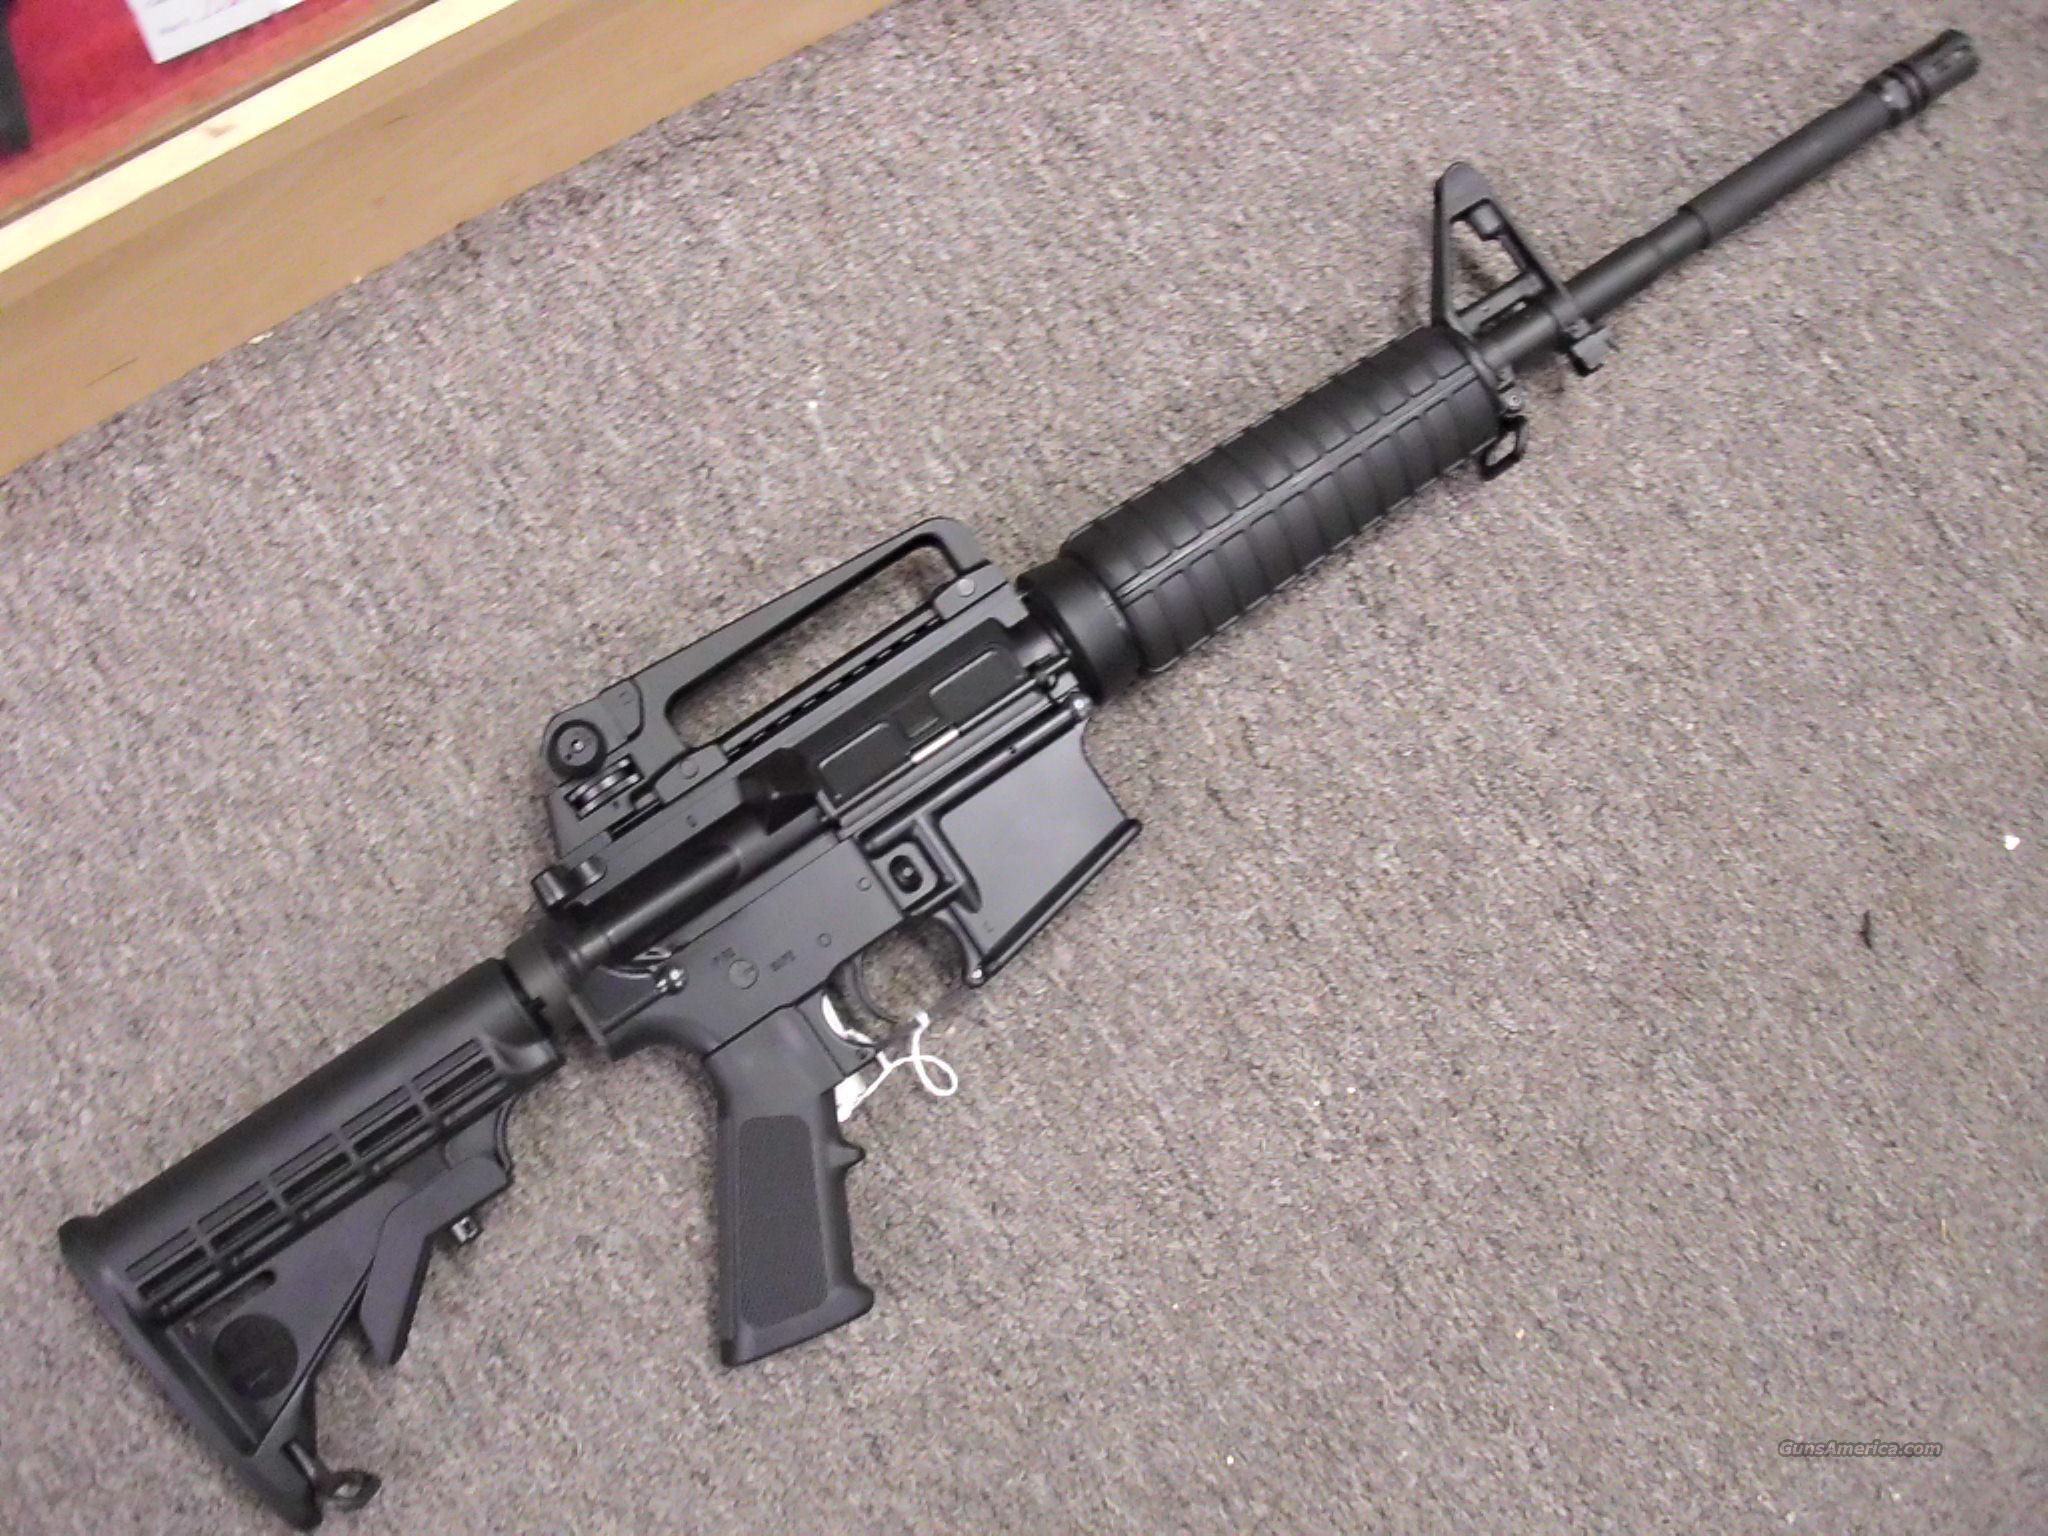 Bushmaster A3 Telef 16 M4 AR 15 5.56 NEW AR15 For Sale